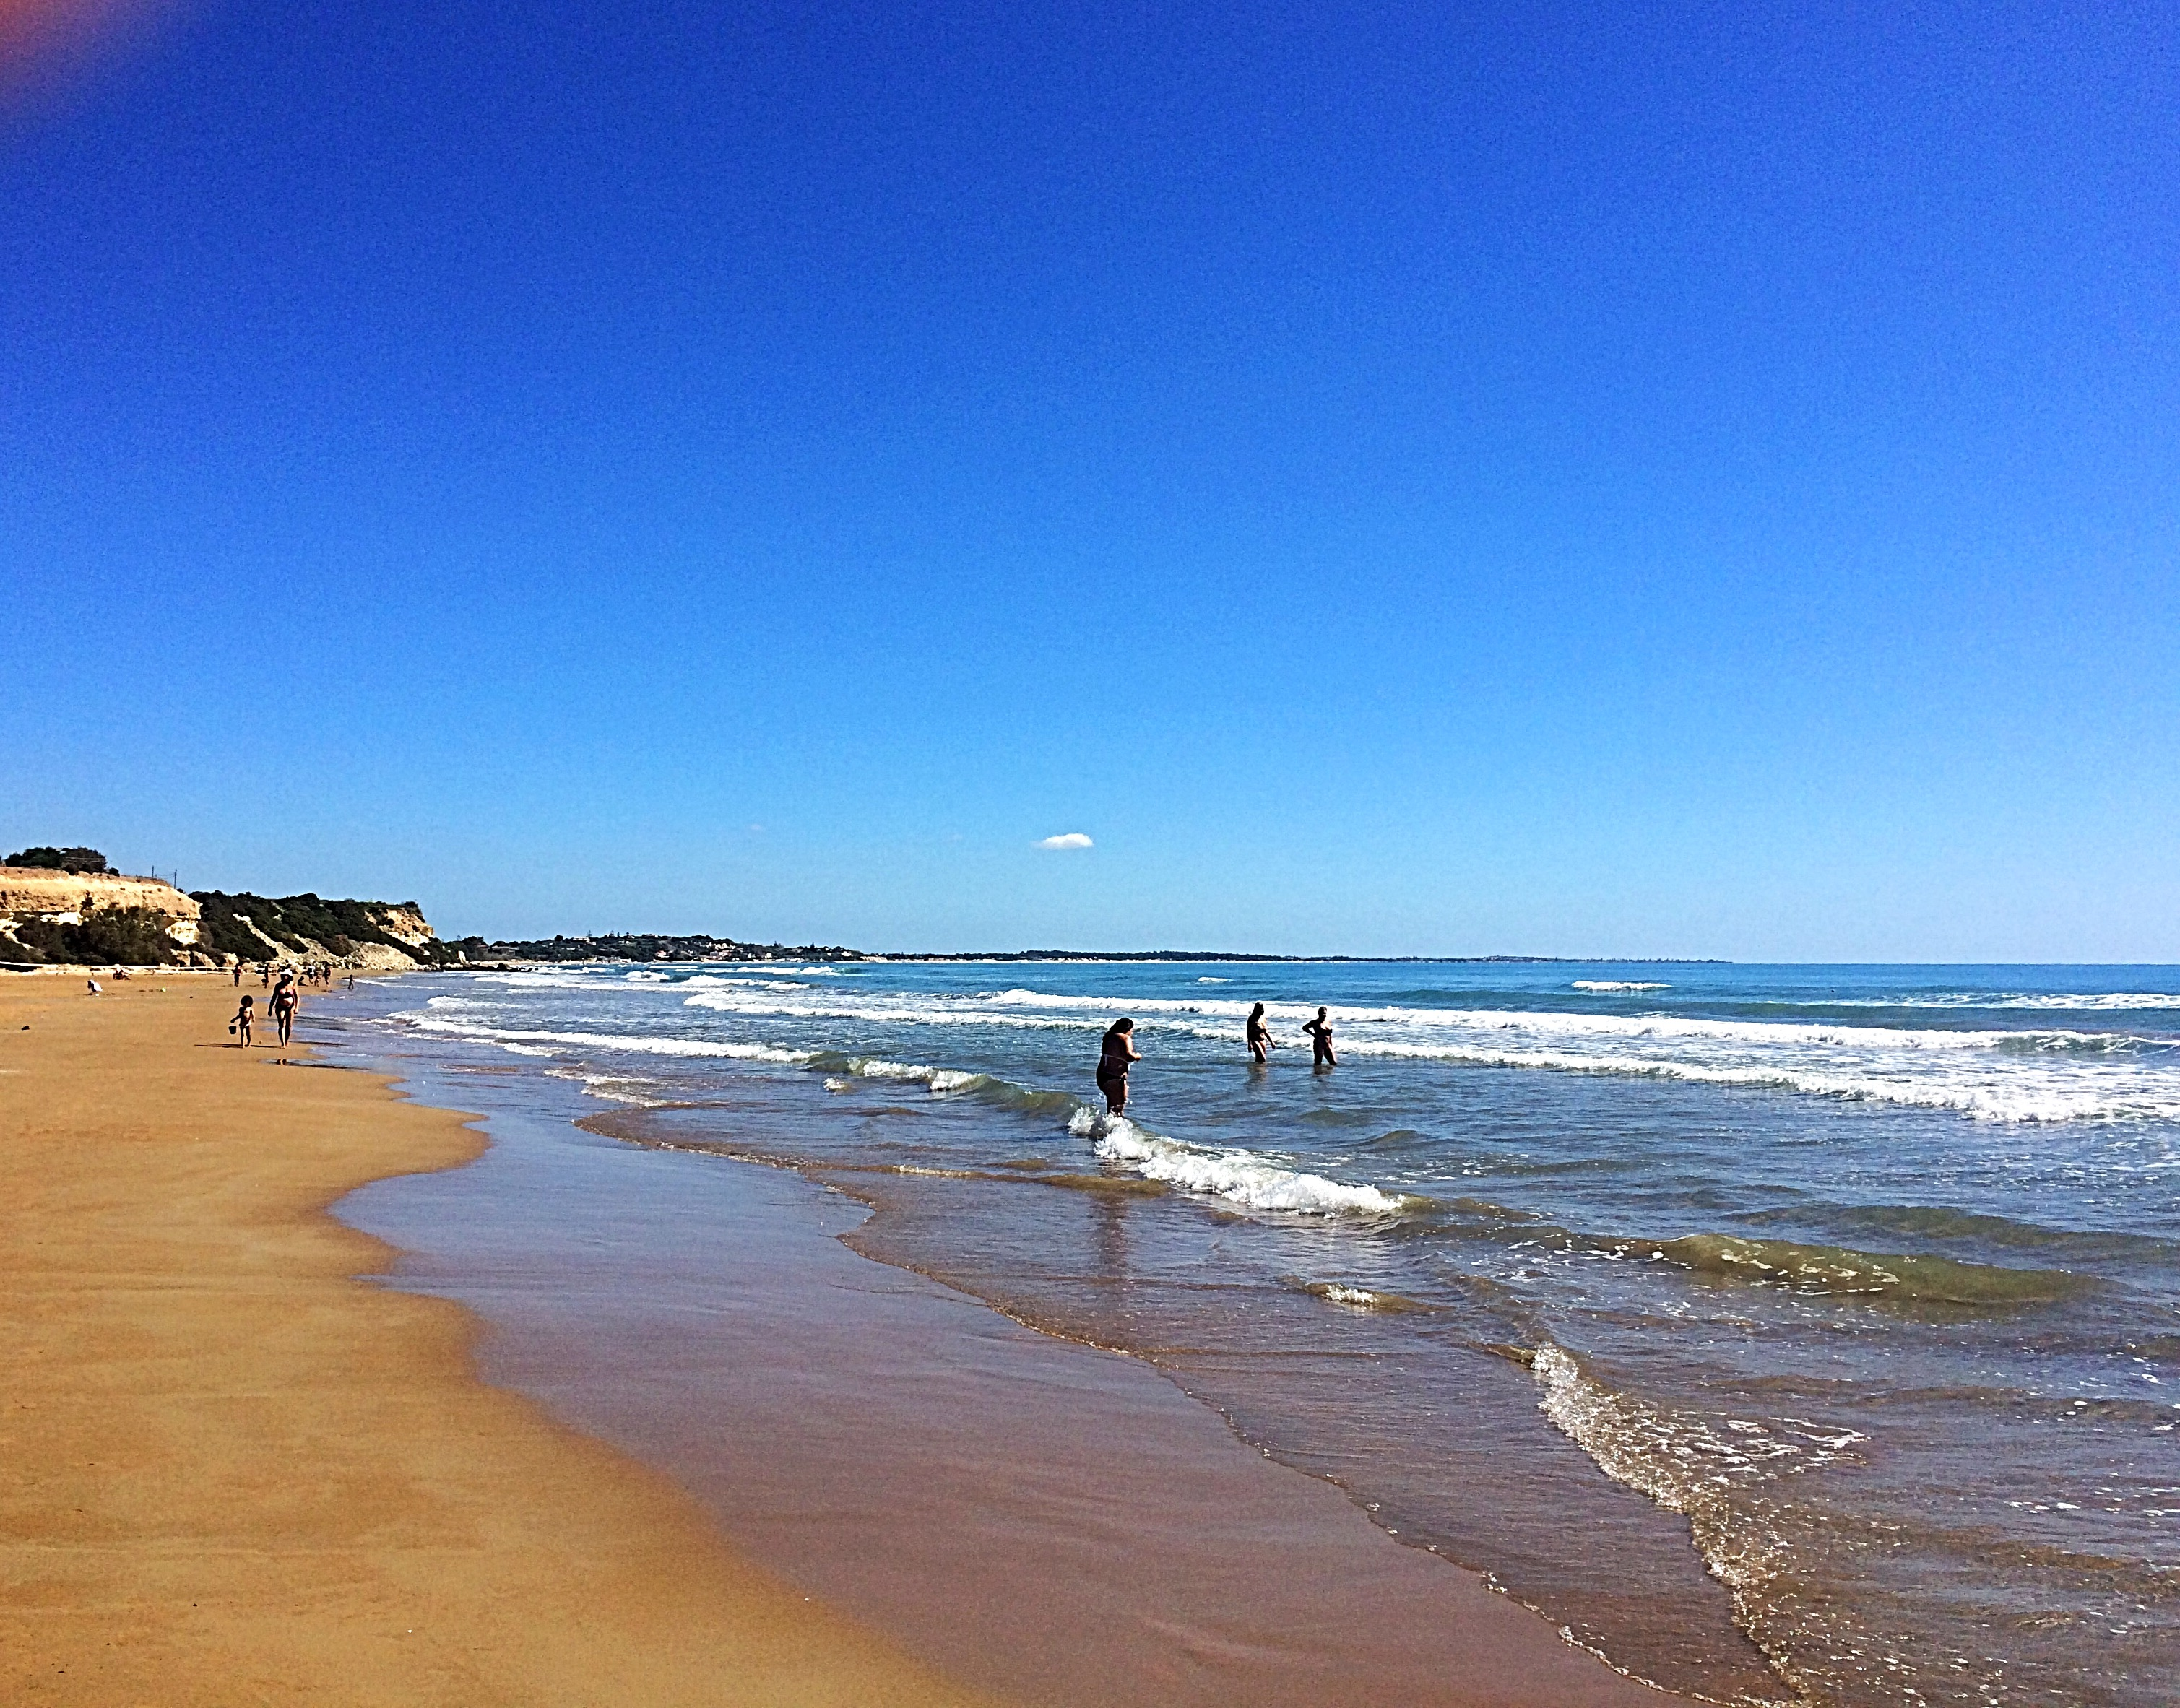 Pozzalo beach